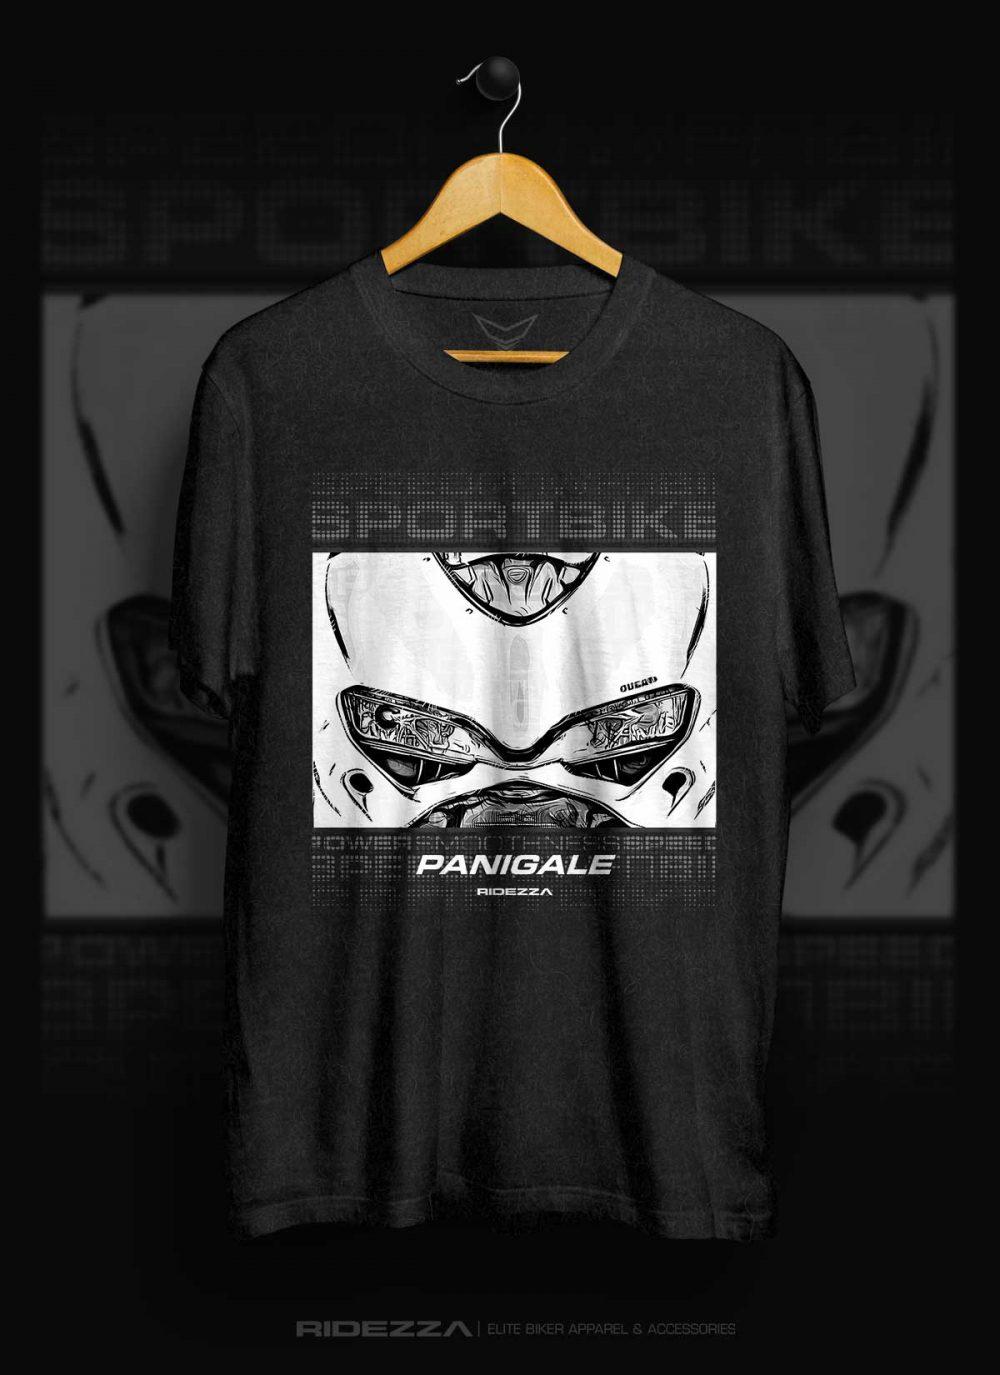 Ducati Panigale Focus T-Shirt